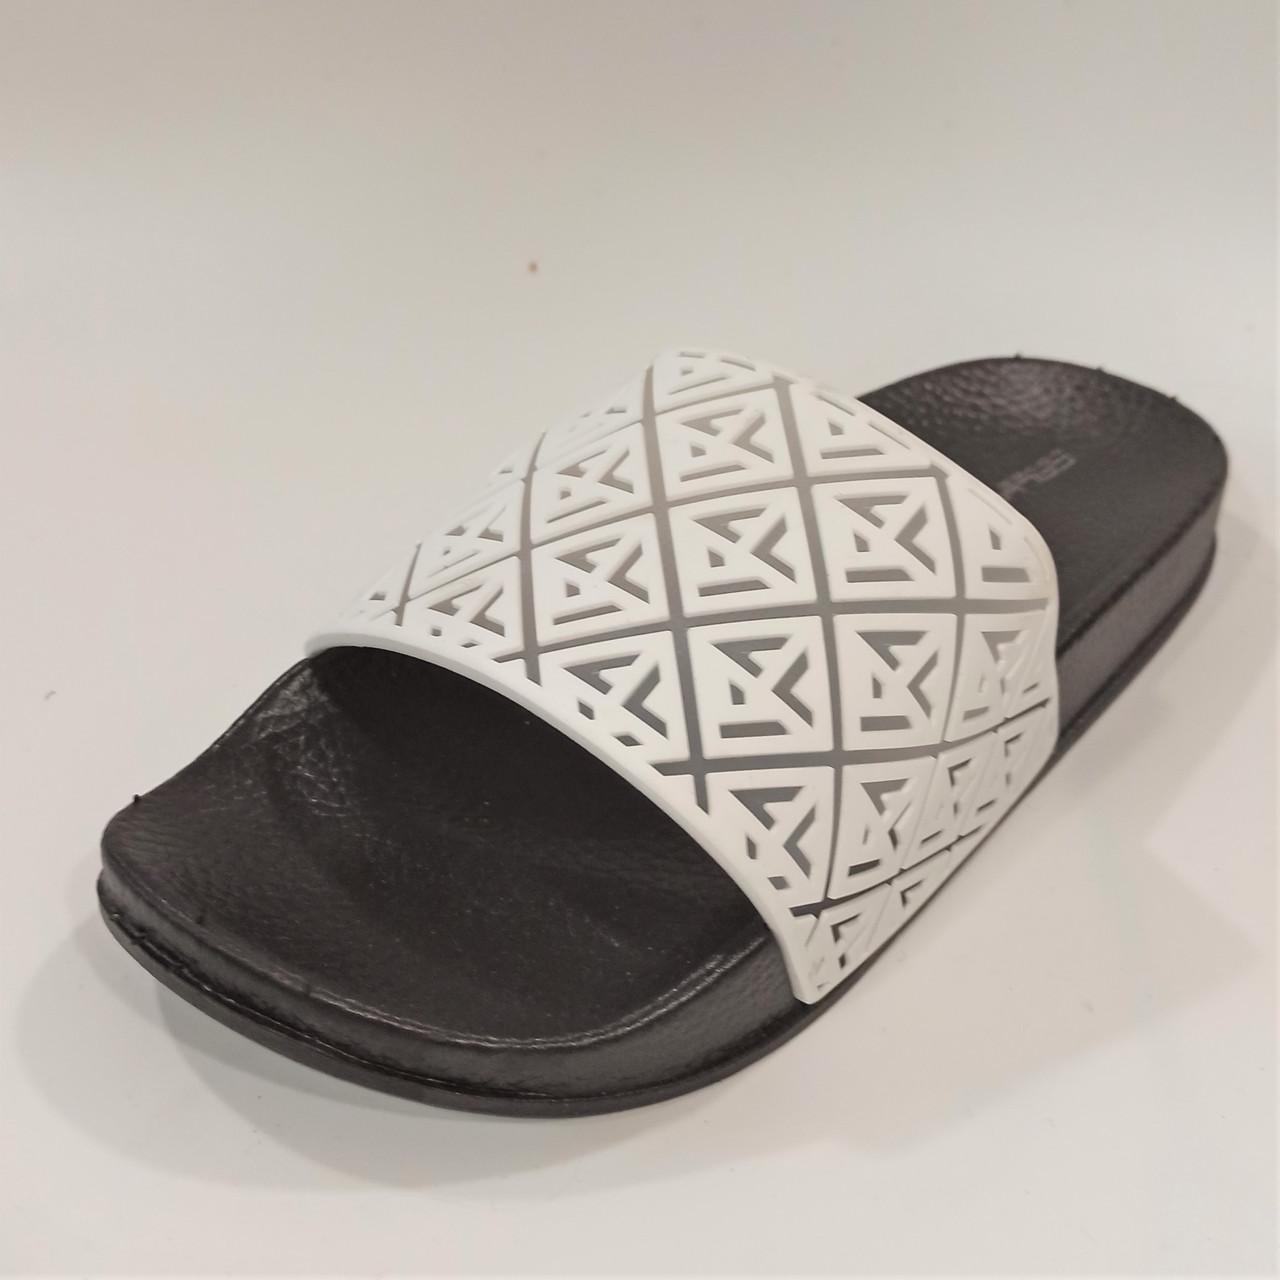 Шлепанцы черно-белые Calypso размеры: 36-40